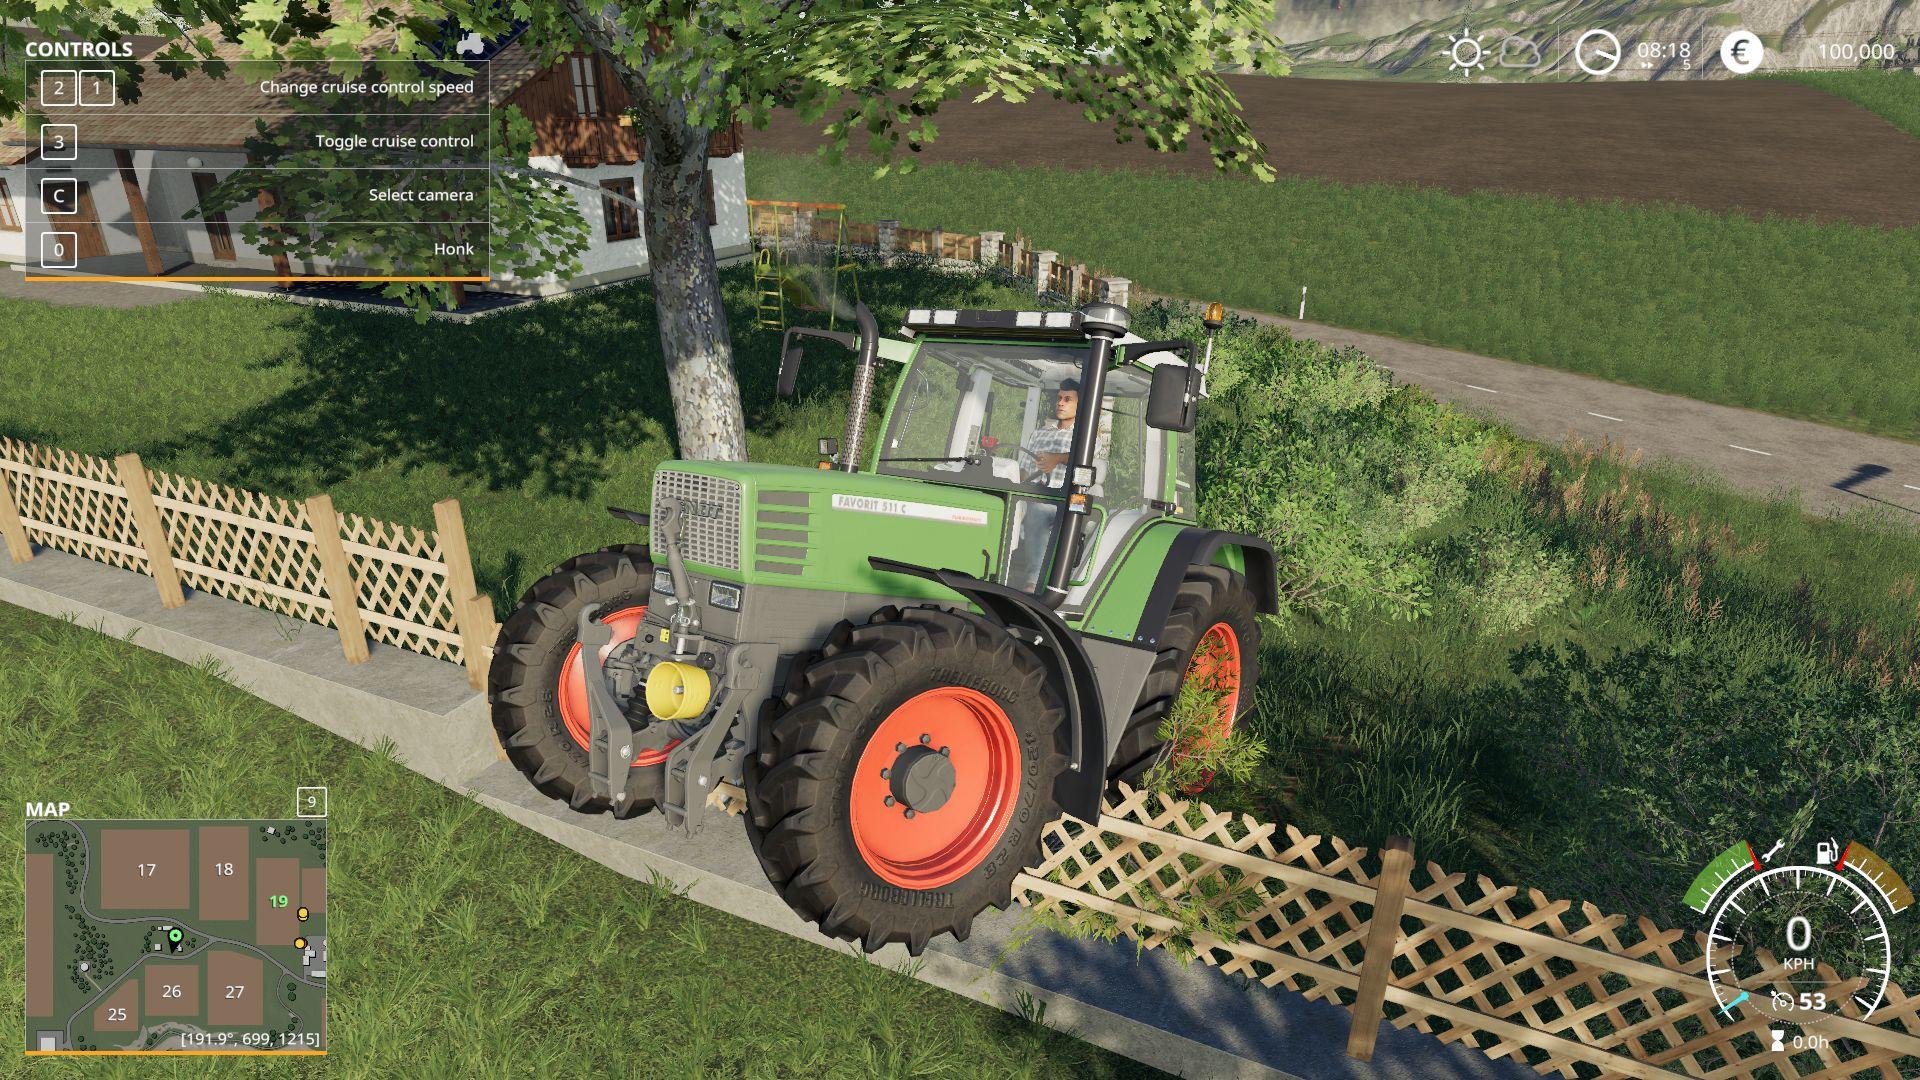 Farming Simulator 19 Laptop and Desktop Benchmarks - NotebookCheck